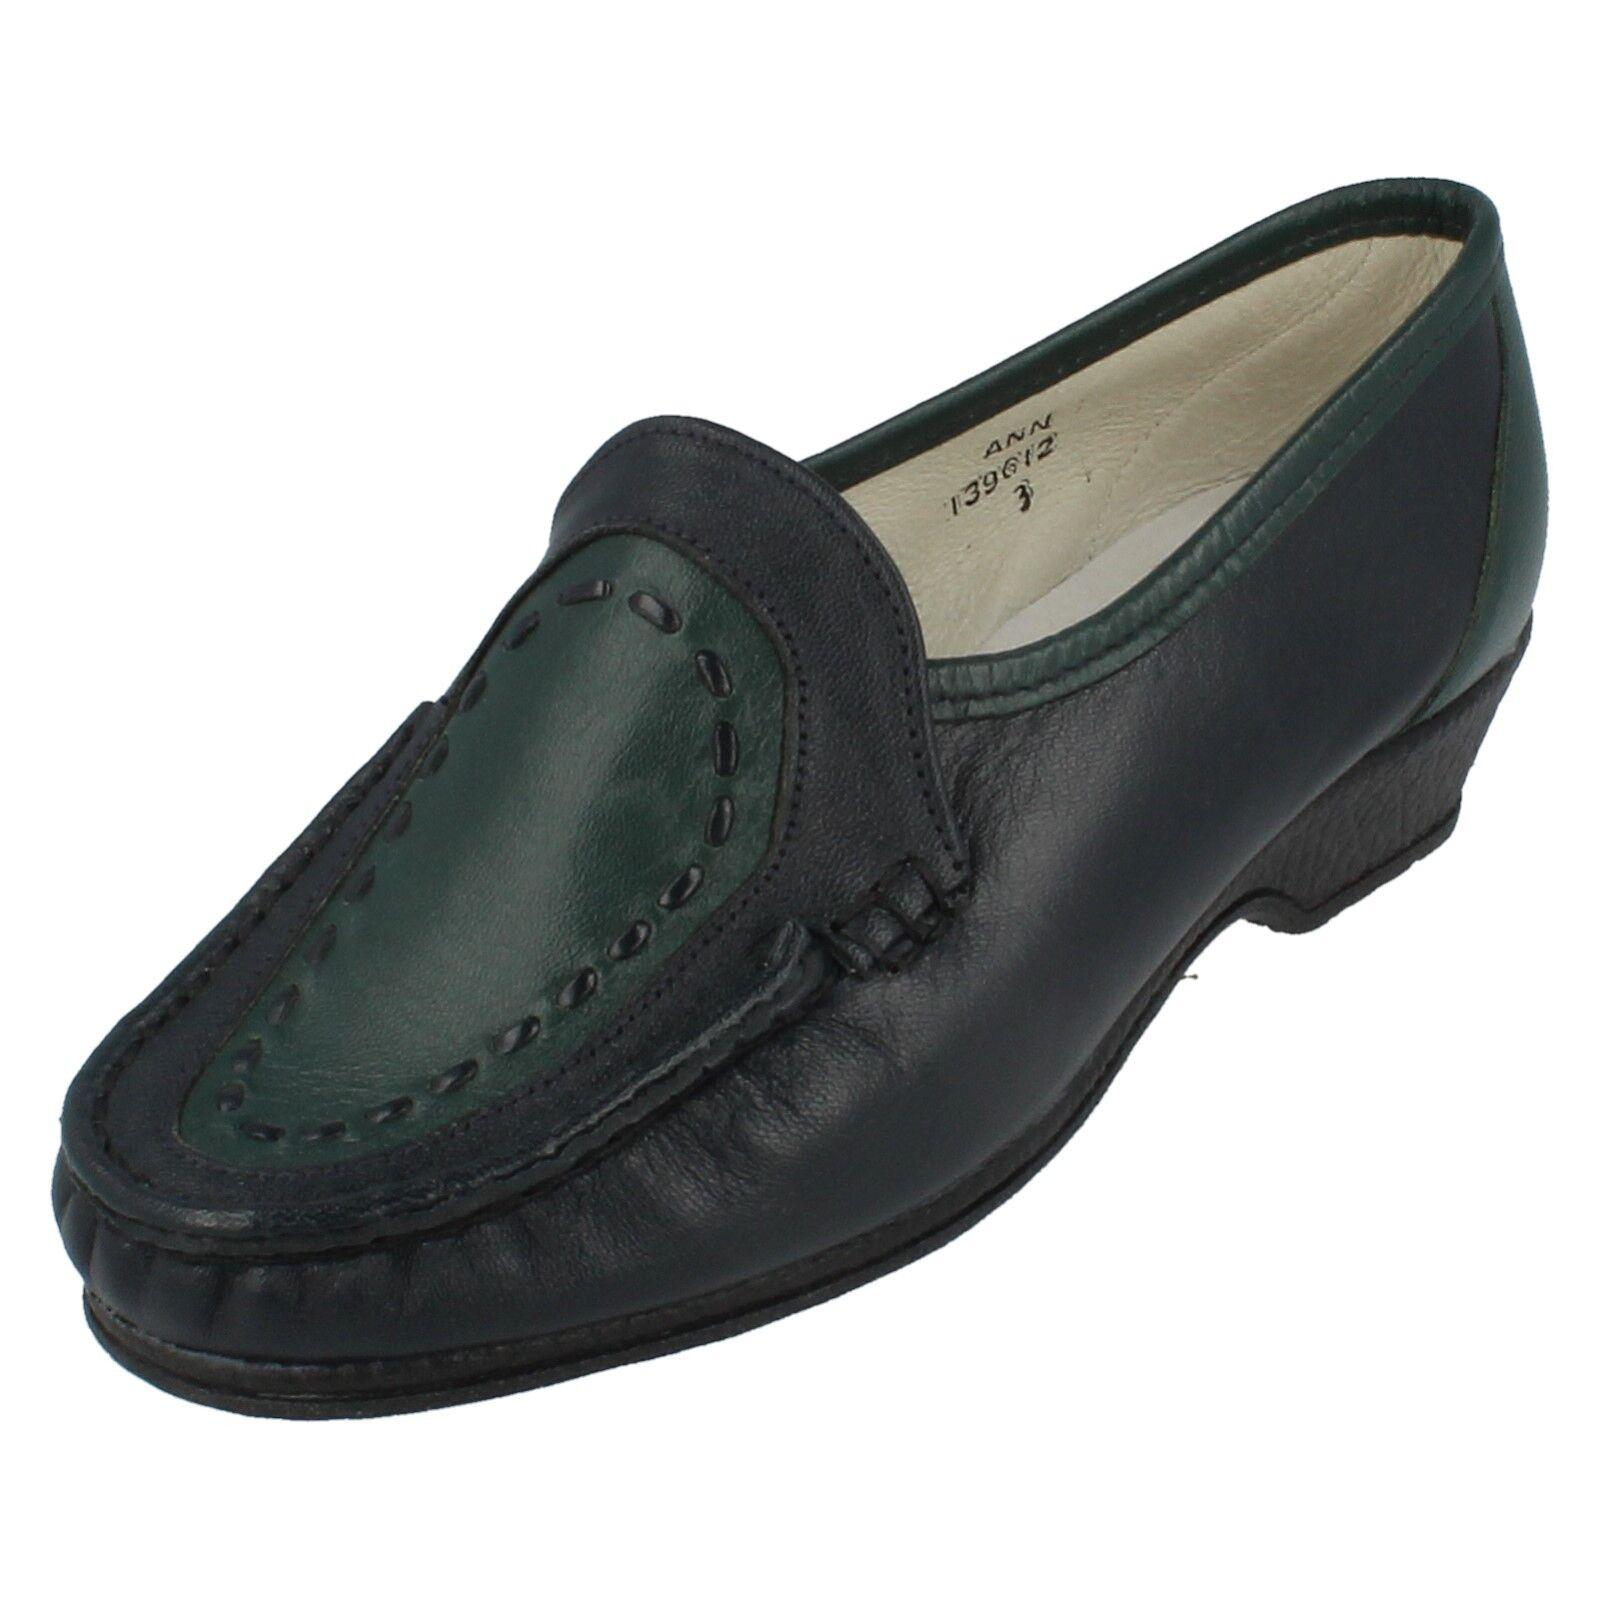 Ladies navy/green leather SANDPIPER shoes style ANN Uk 3EEEEE fitting